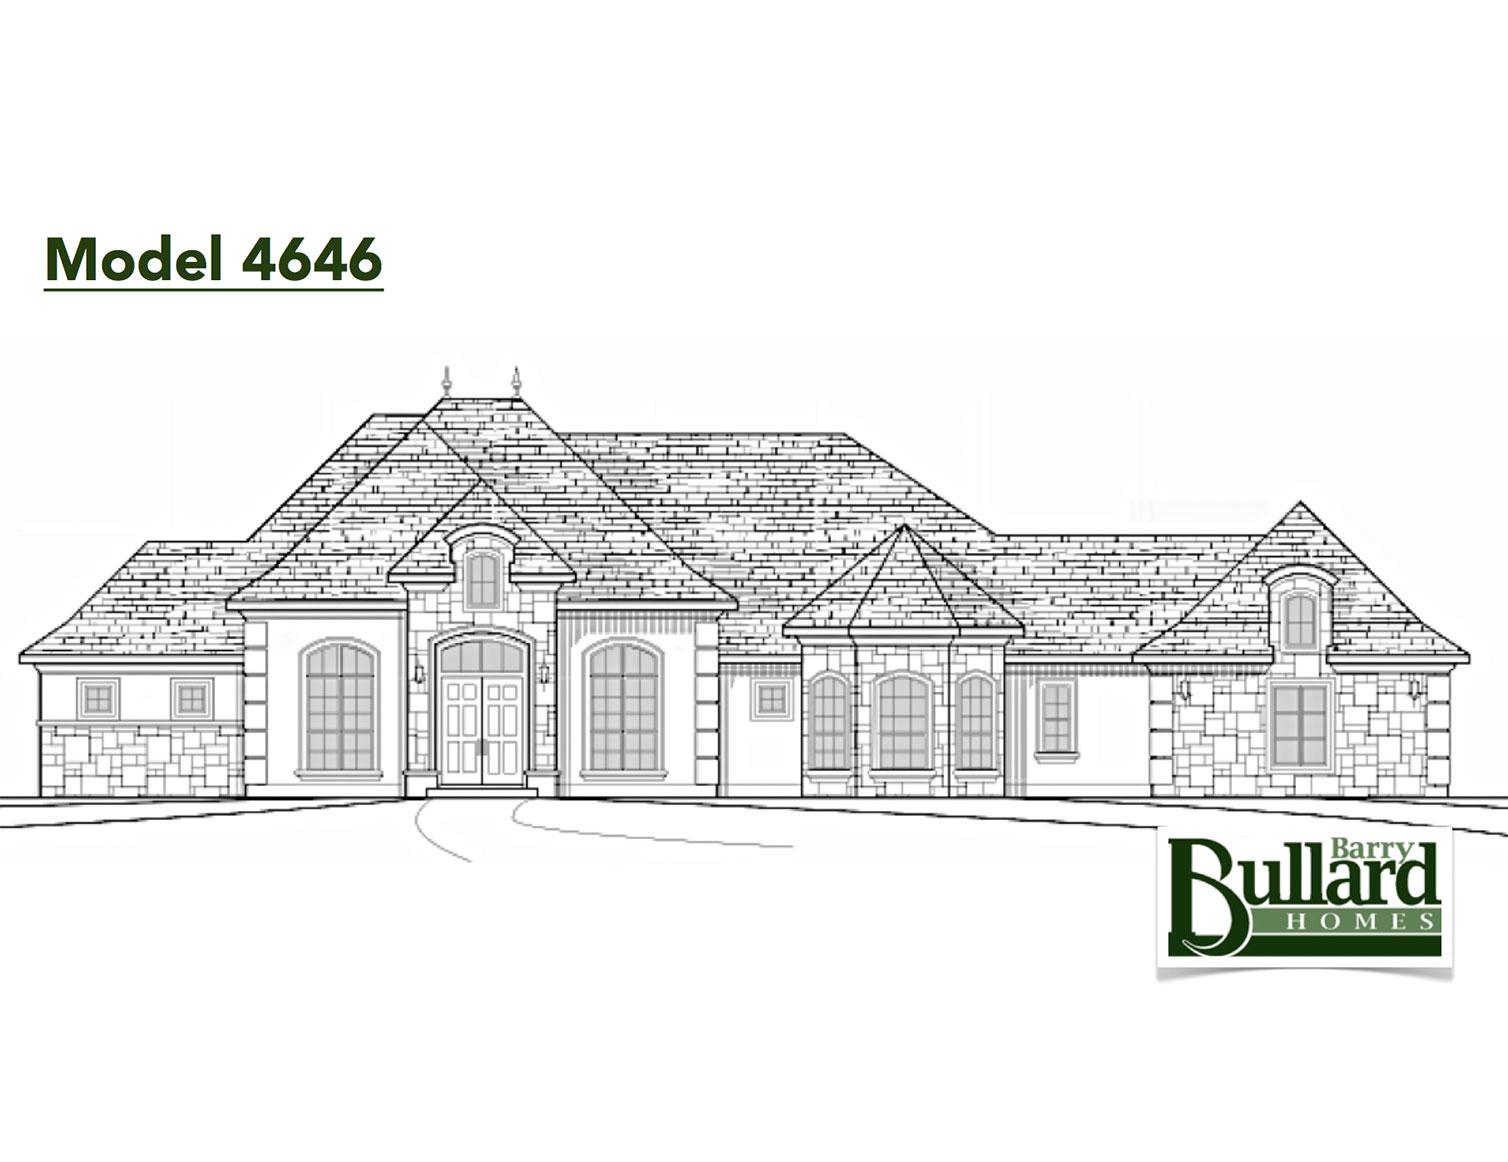 Custom Home Builder Floor Plans: Barry Bullard Homes